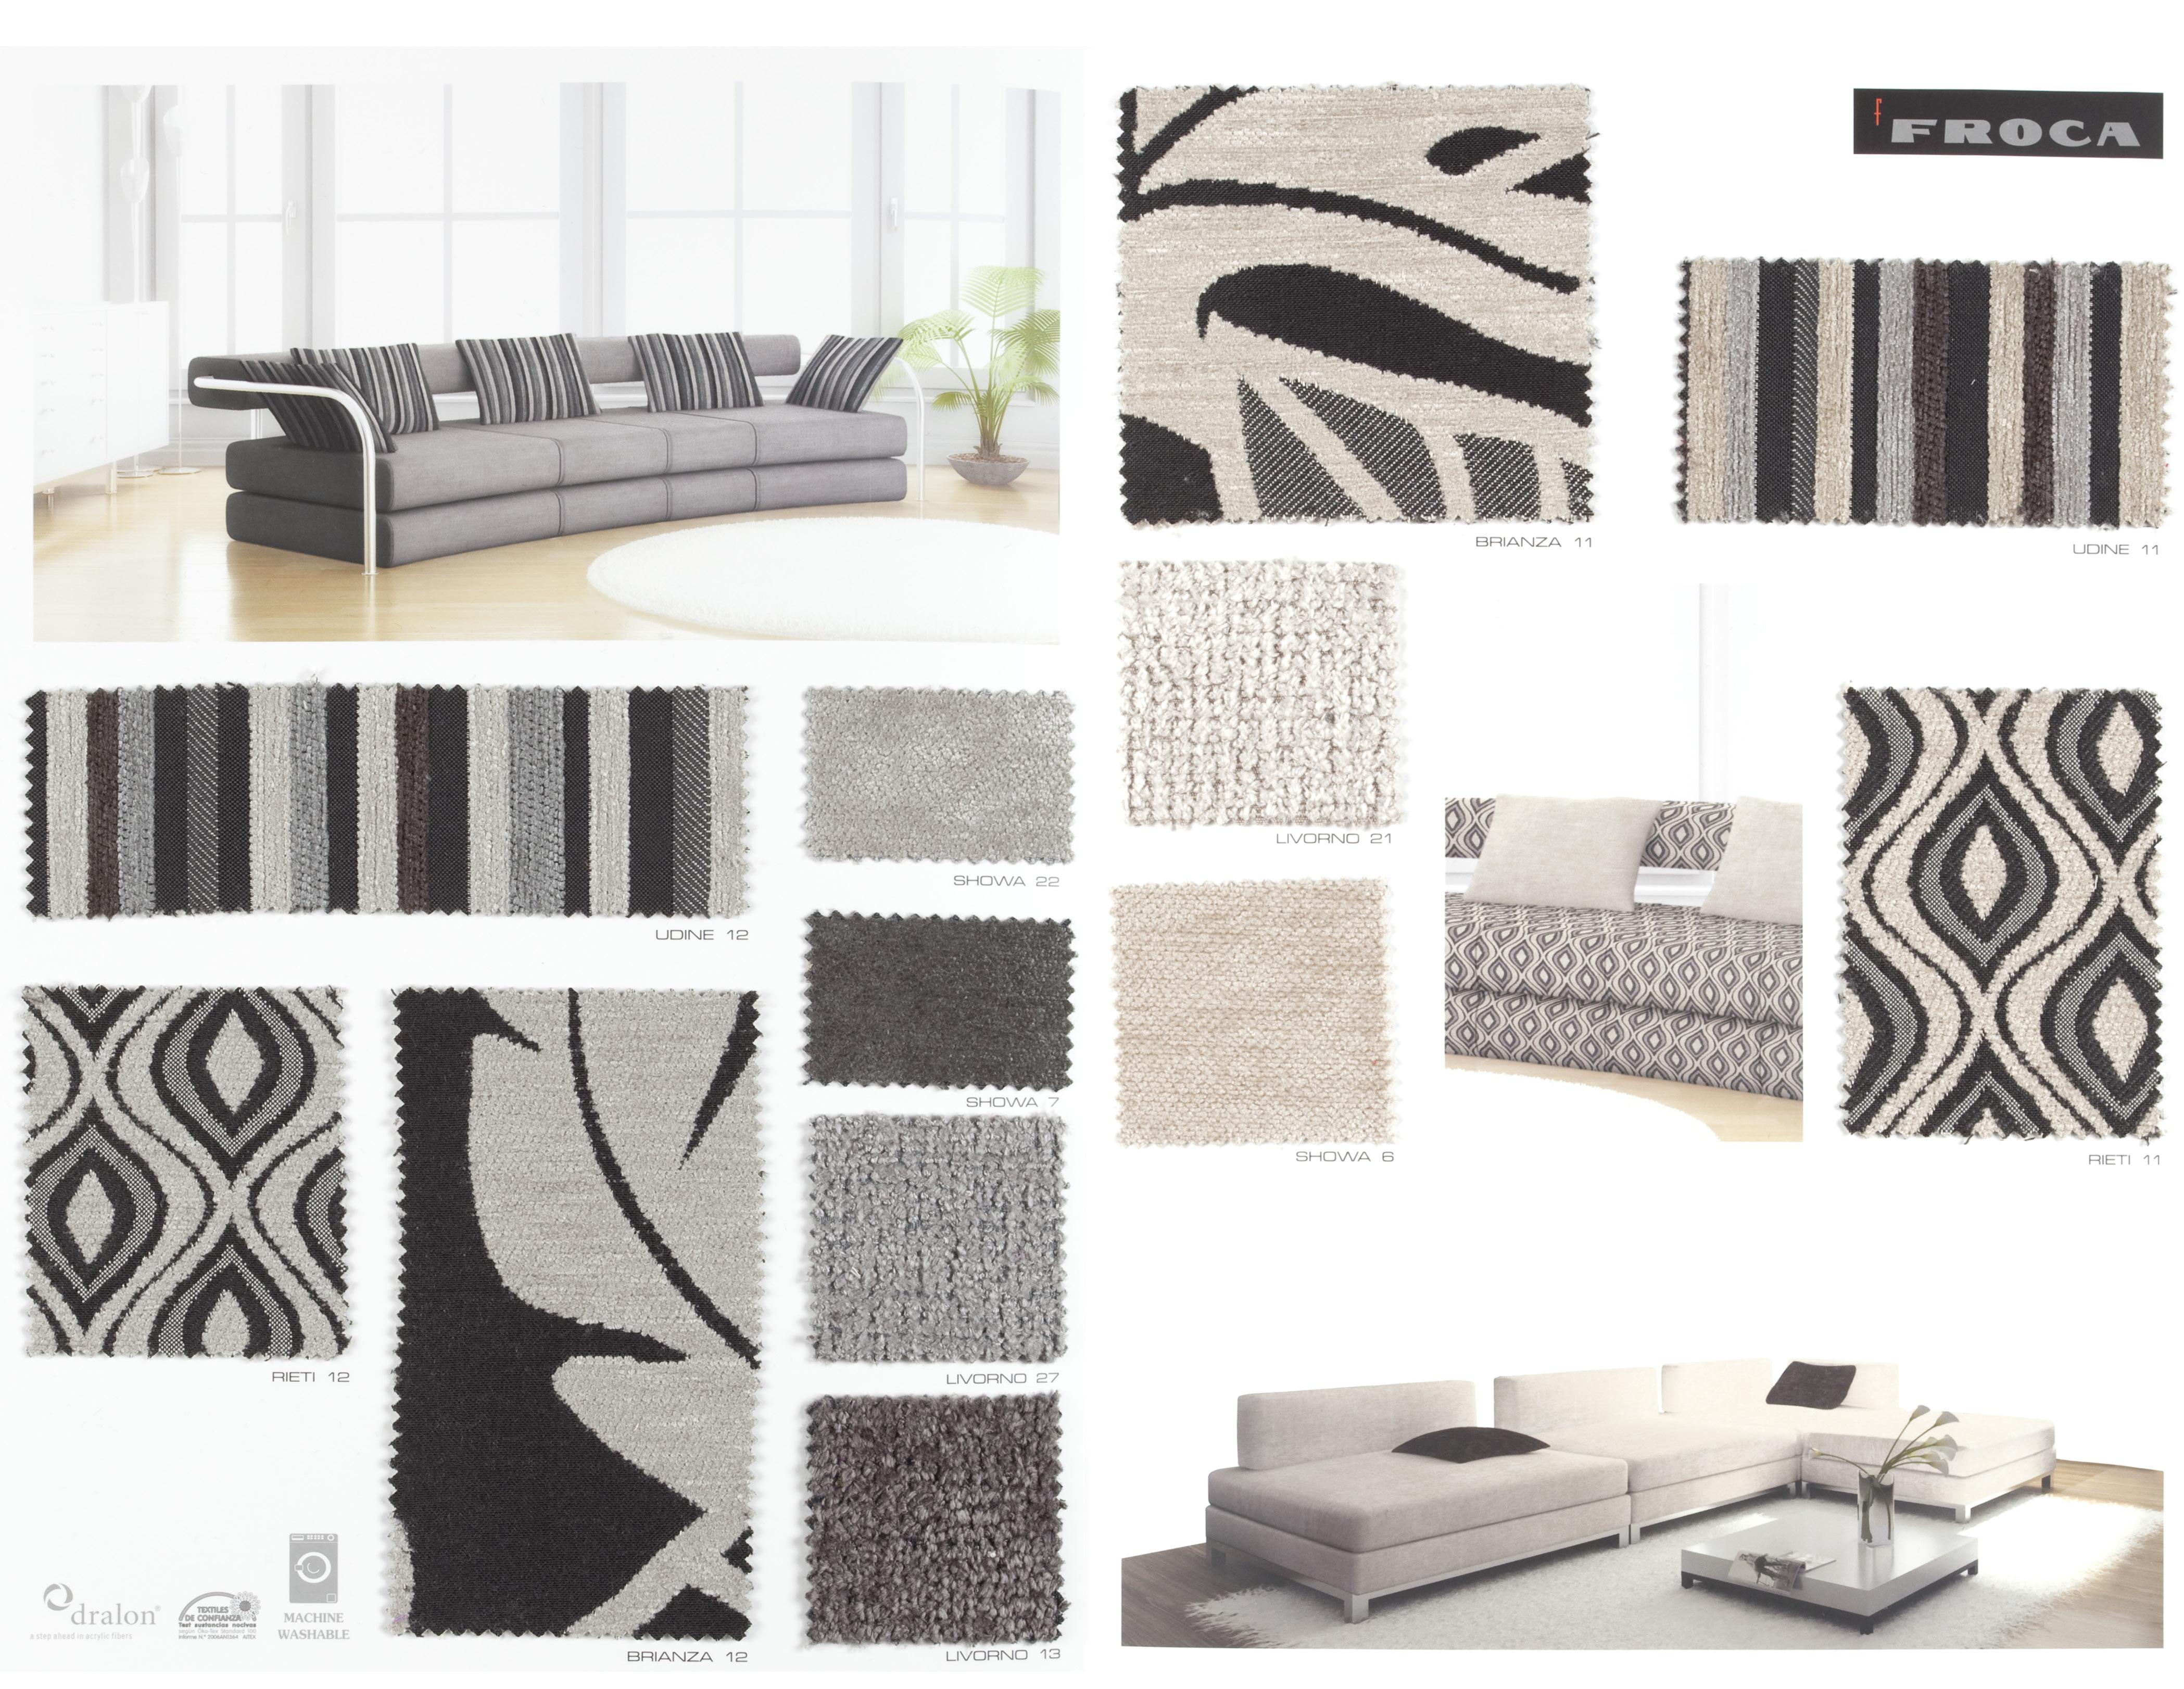 Tapicer a brianza la dama decoraci n for Catalogo tapicerias para sofas